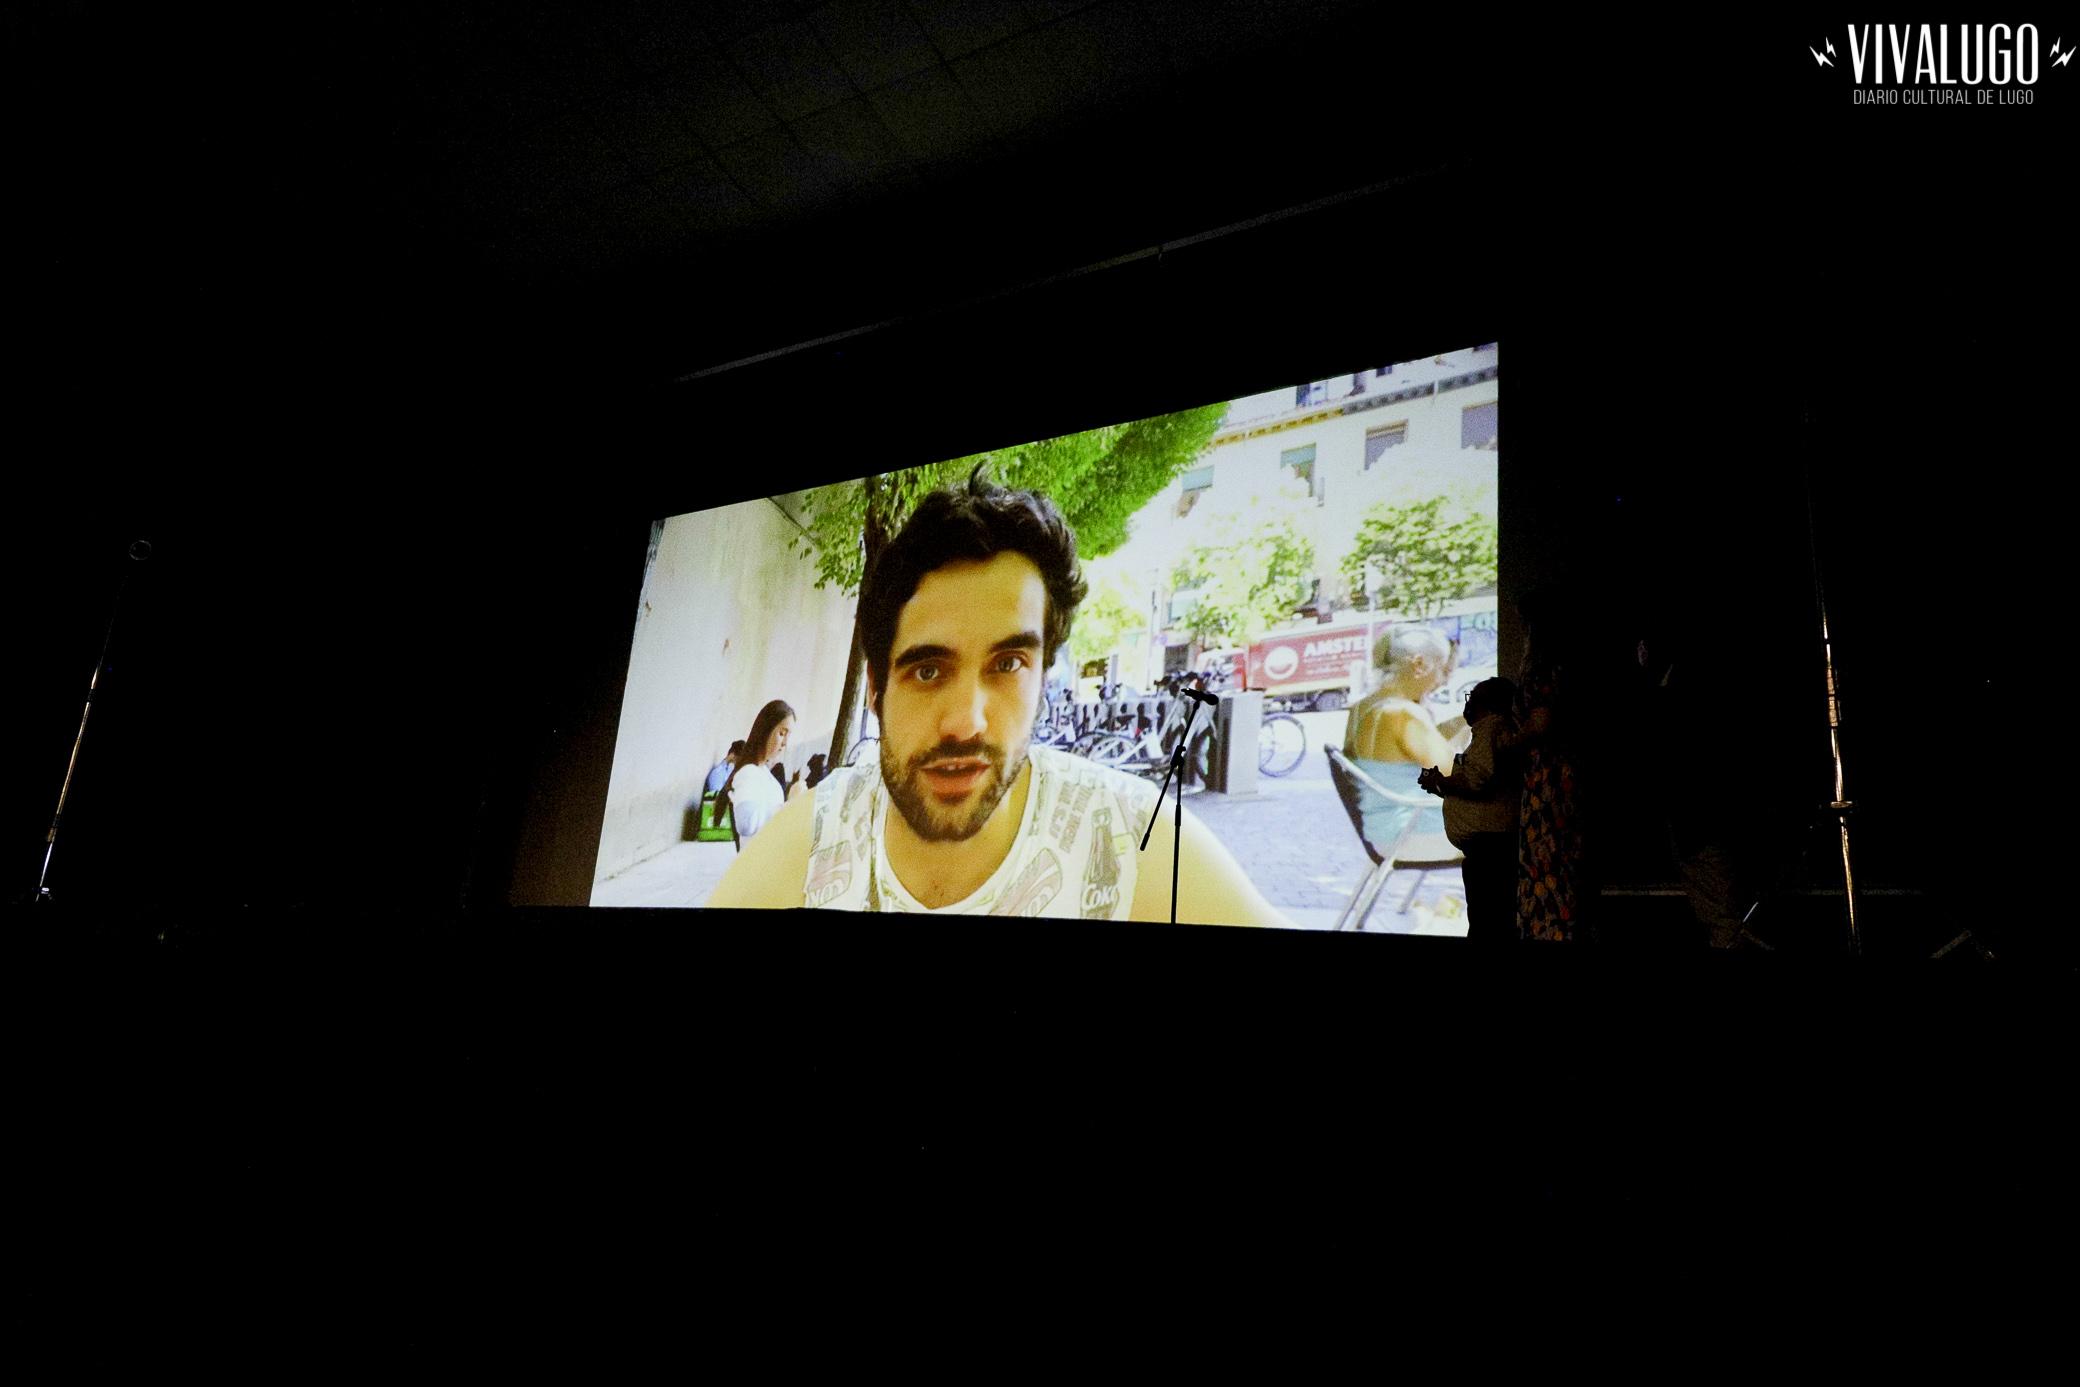 Xoán Forneas Foto de Loopez para Viva Lugo